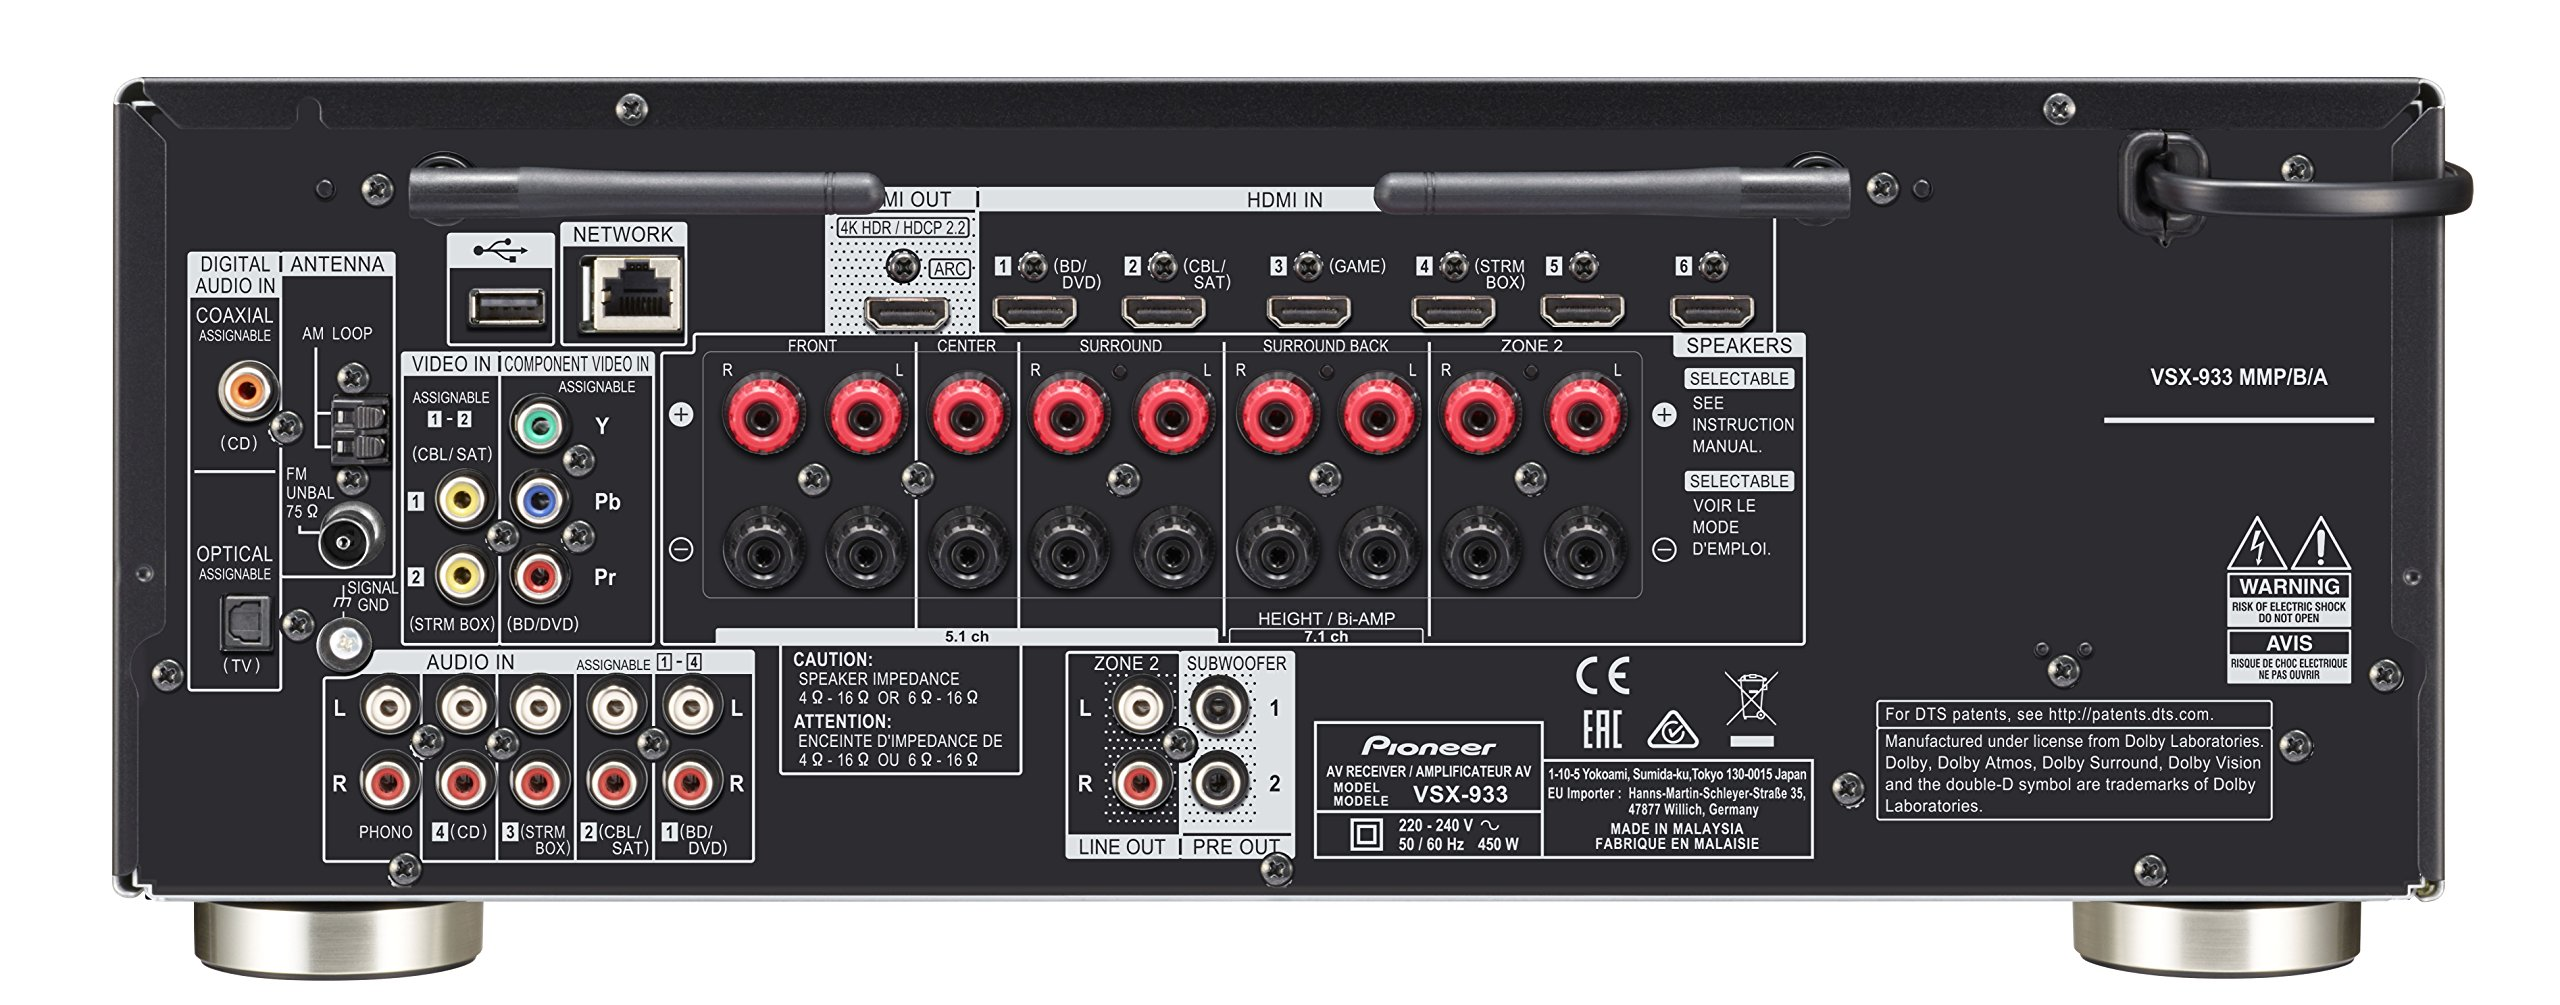 81V8IXyiKtL - Pioneer VSX-933(B) 7.2 Channel AV Receiver (Hifi Amplifier 135 Watt/Channel, Multiroom, Wifi, Bluetooth, Streaming…